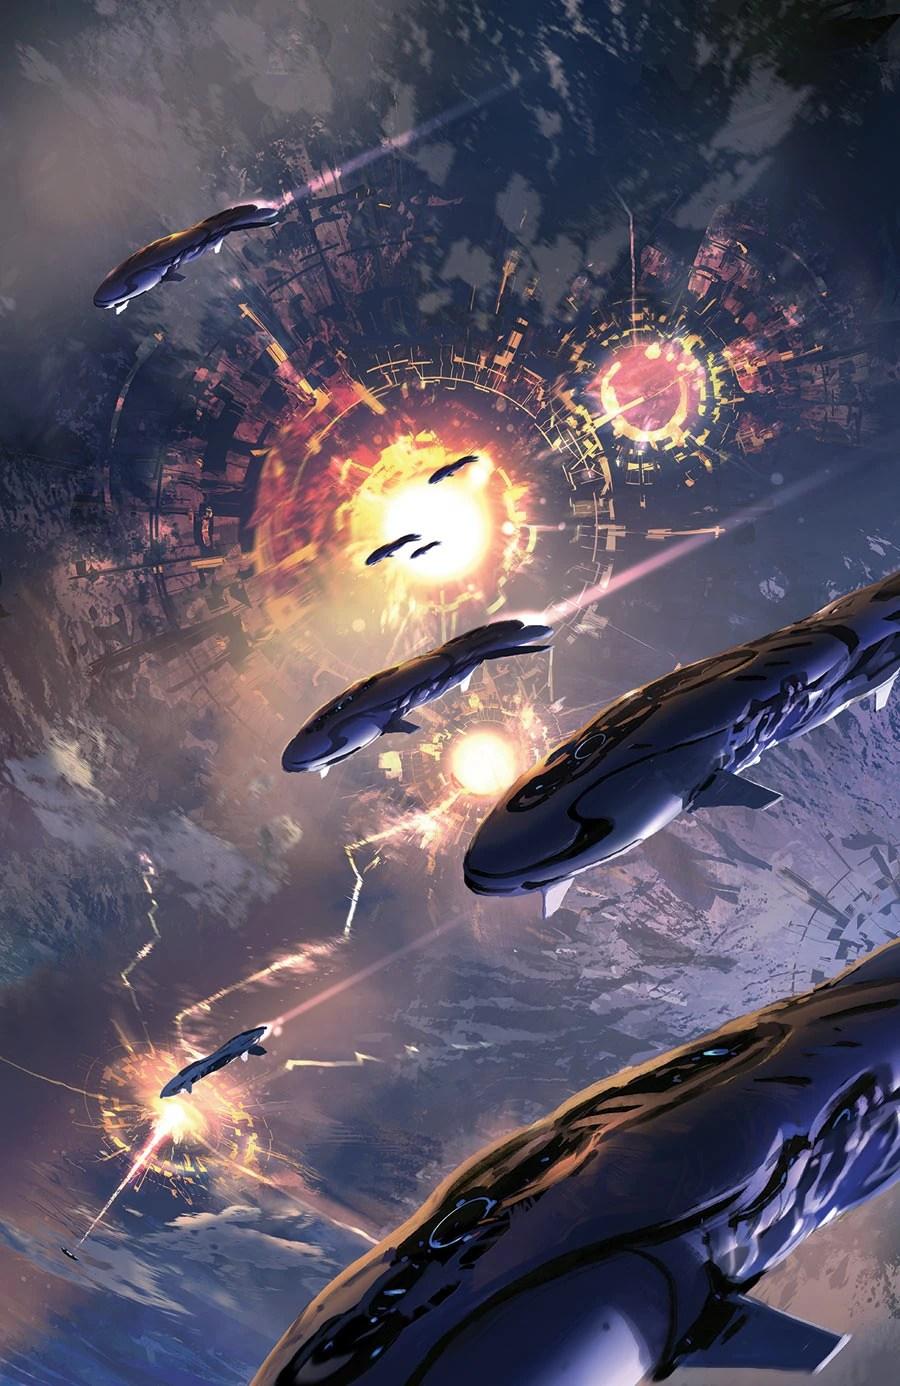 Halo Wallpaper Fall Of Reach Halo Escalation Issue 17 Halo Nation Fandom Powered